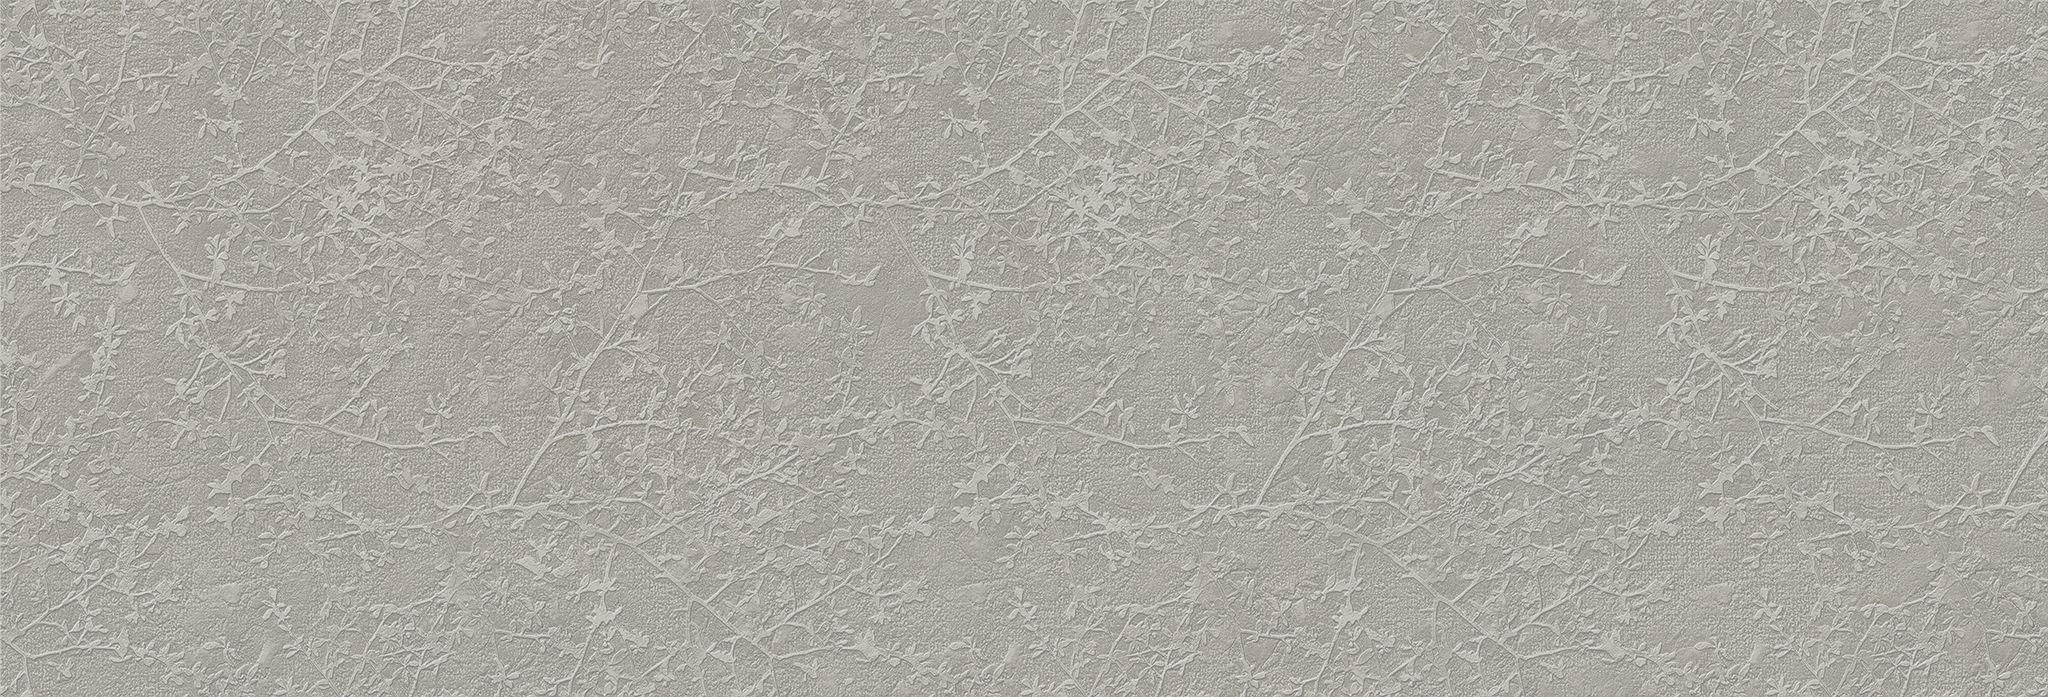 Concrete look 12 x 36 serendy cenere kira decor ceramic tile dailygadgetfo Choice Image